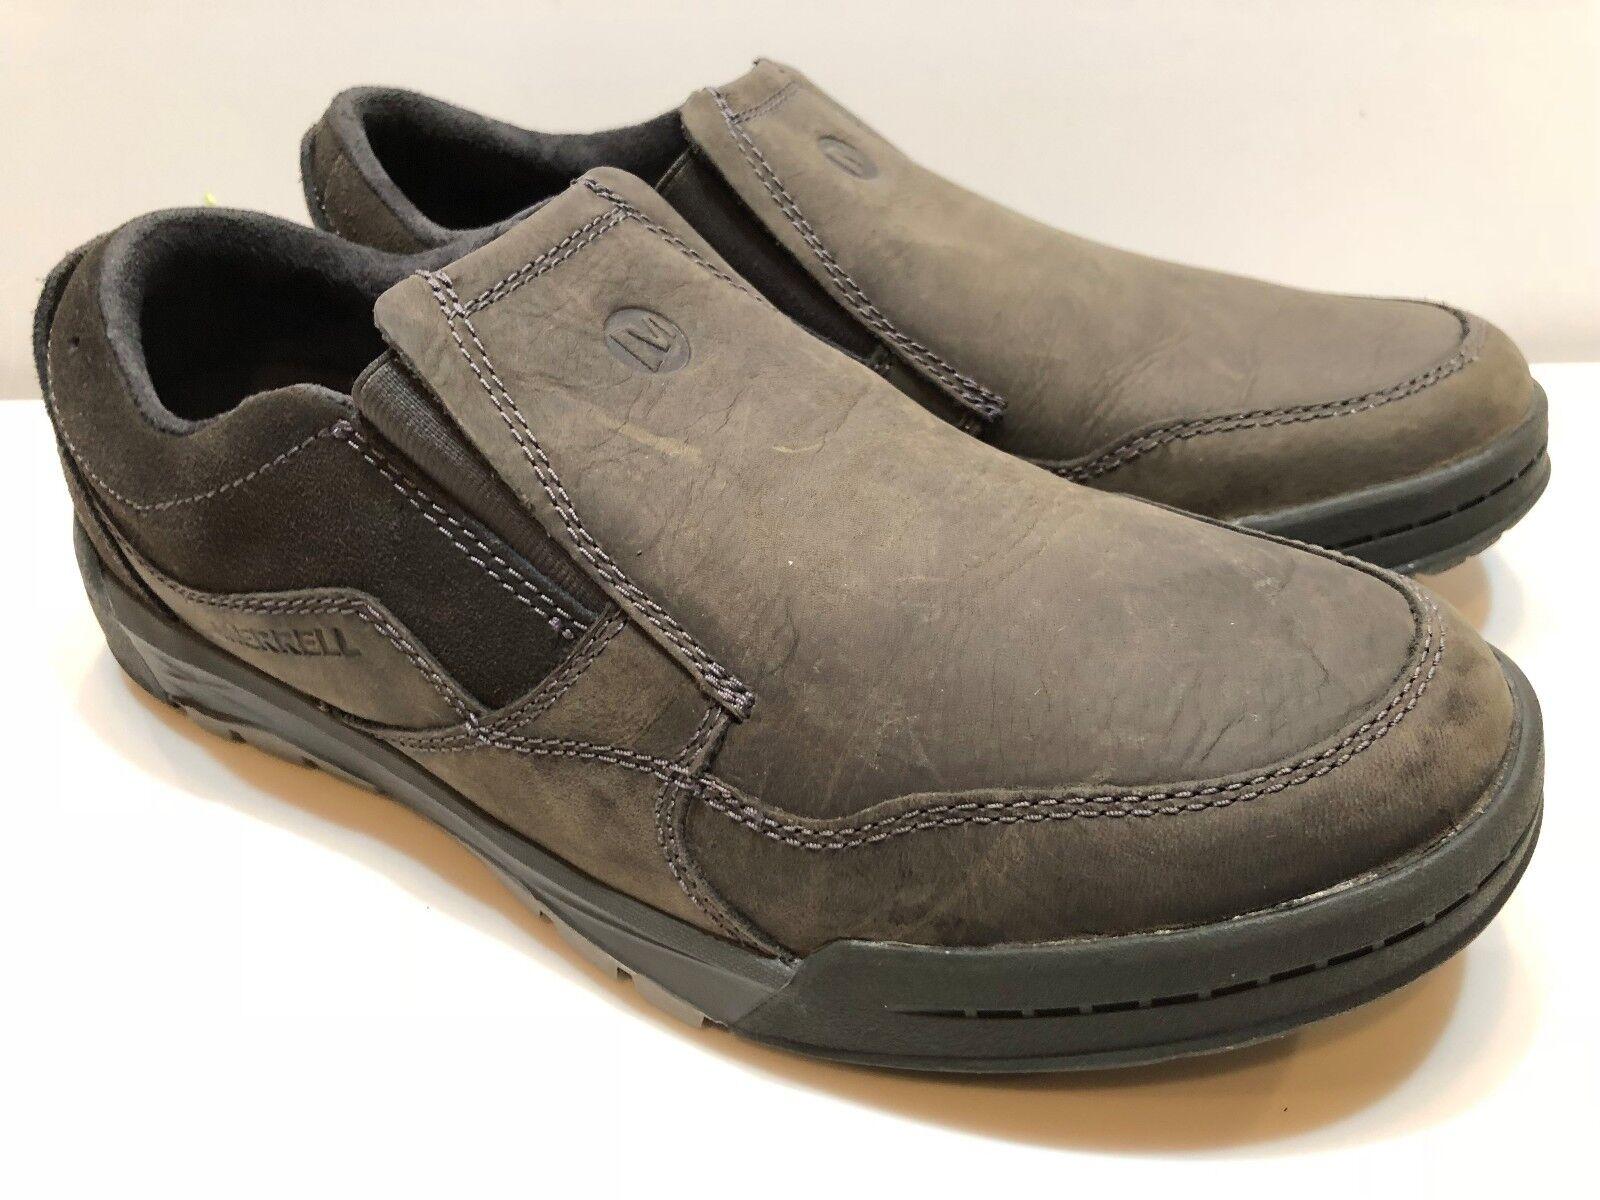 Merrell Men's Berner Moc Fashion Sneaker - Size 8.5